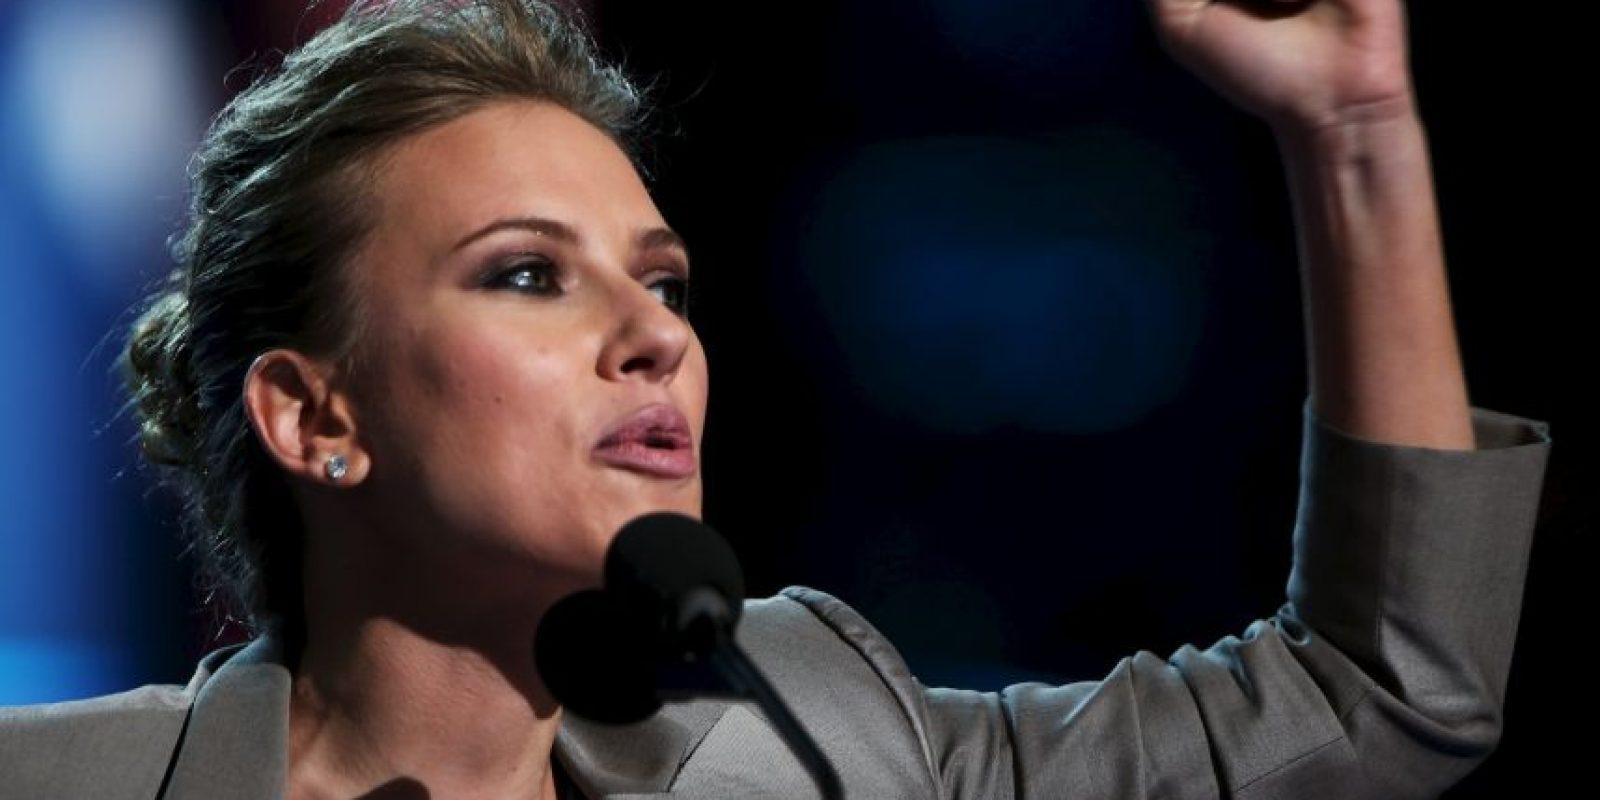 Scarlett Johansson se mostró alegre por la candidatura de Hillary Clinton. Foto:Getty Images